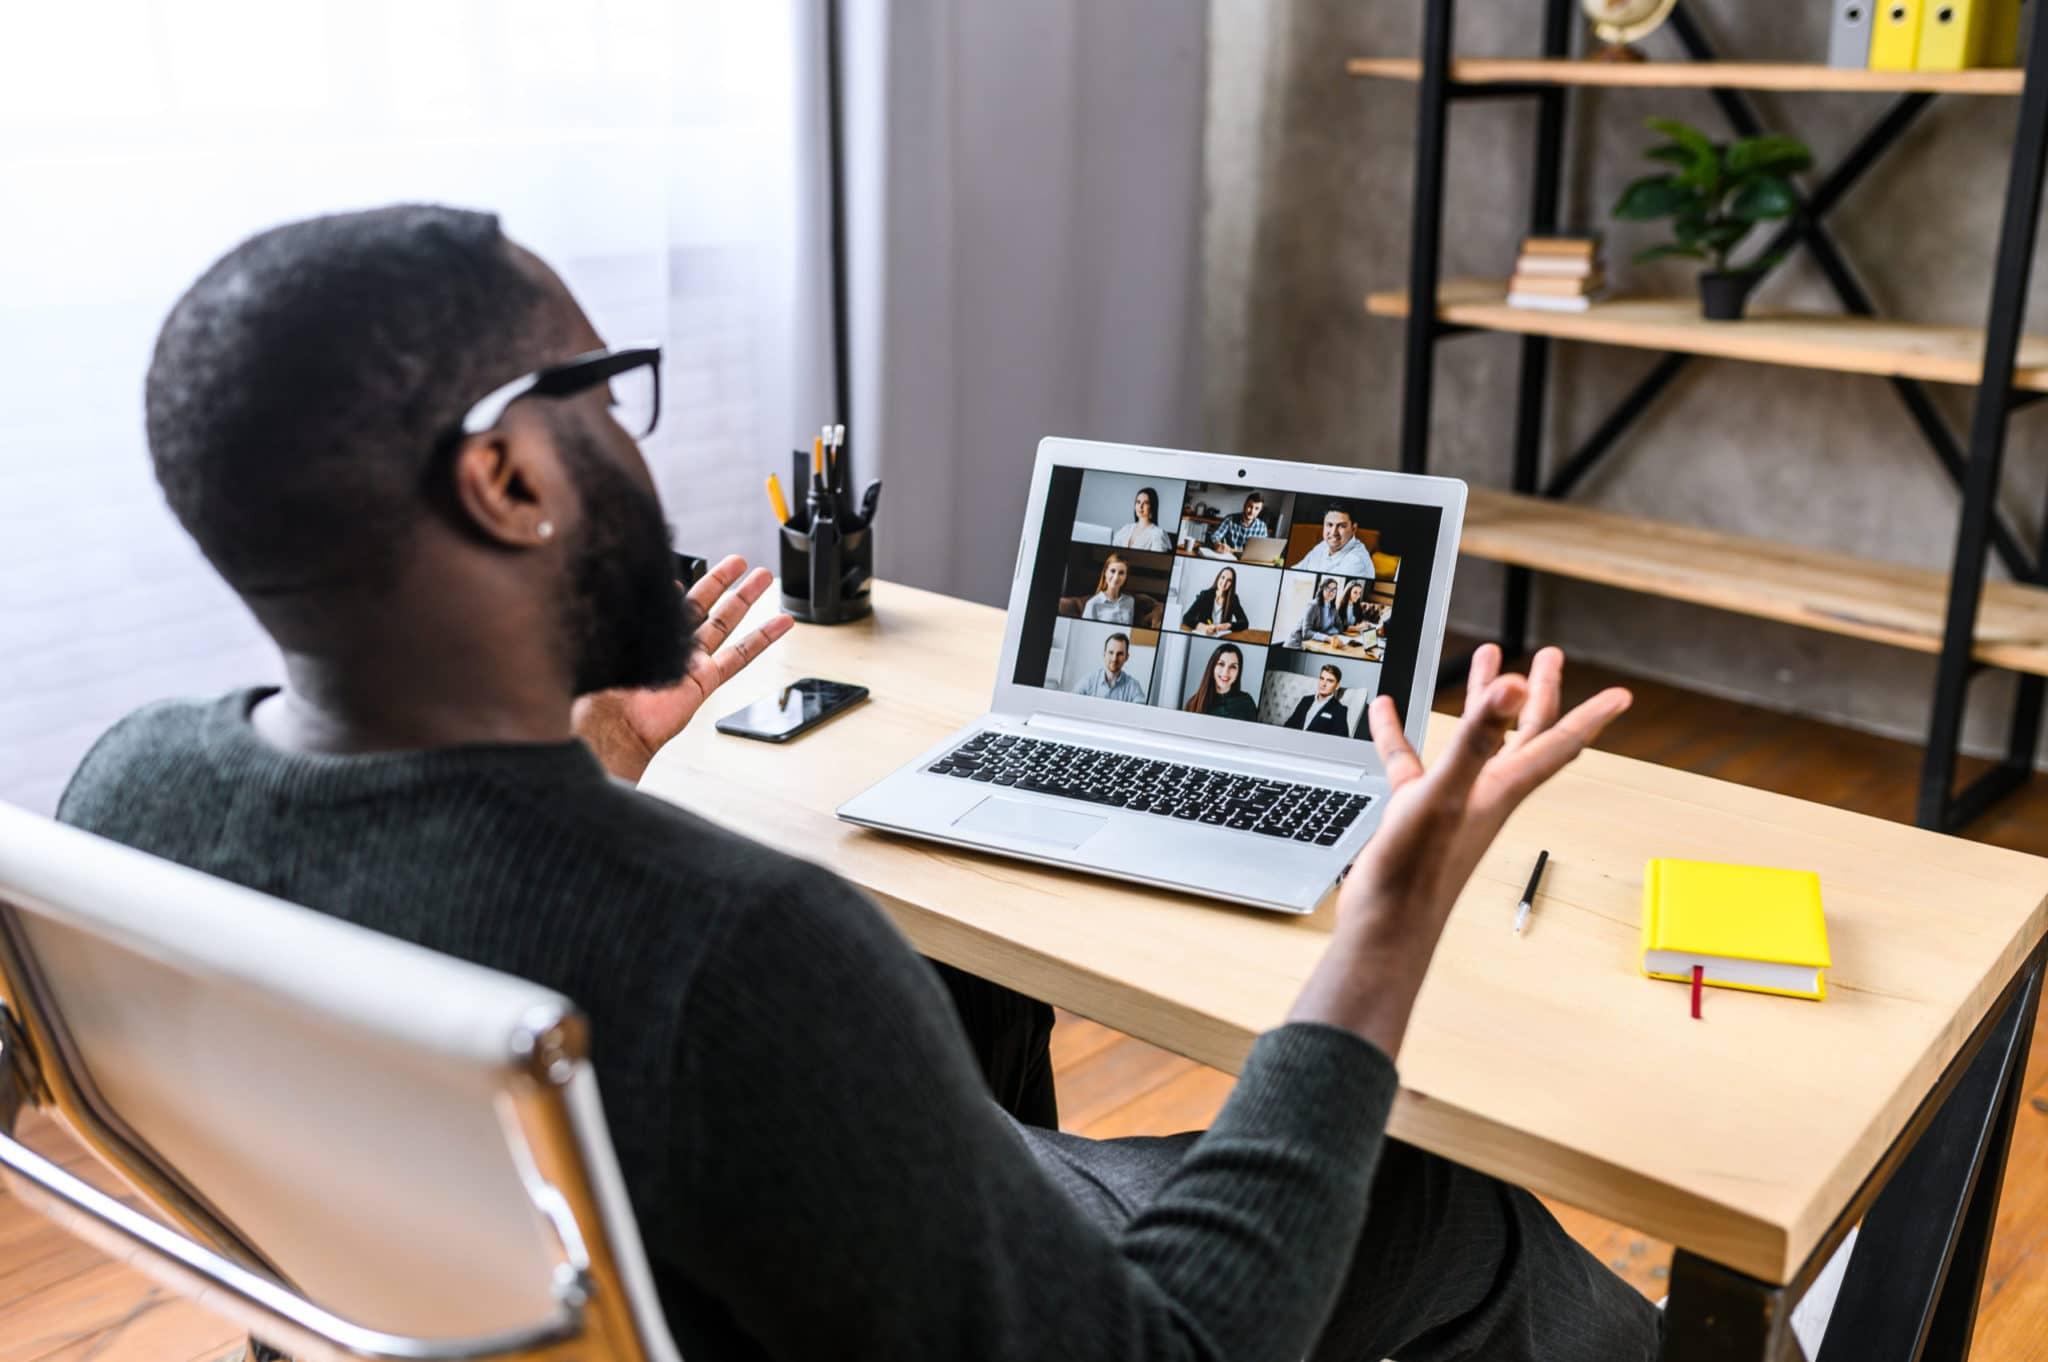 man shrugs in team online employee training